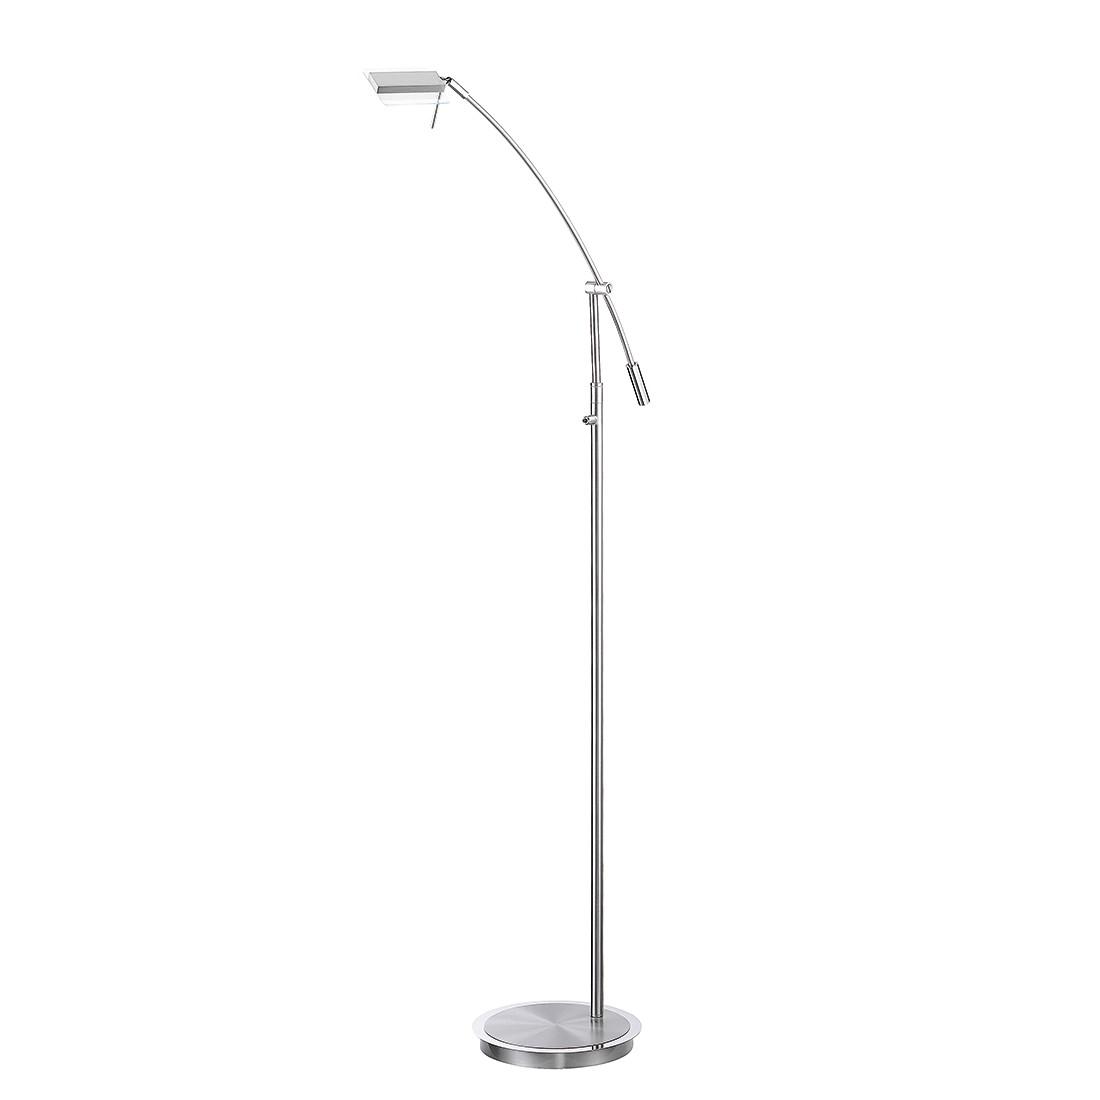 LED-Standleuchte Kamminke ● Nickel Matt ● Silber- FLI Leuchten A+